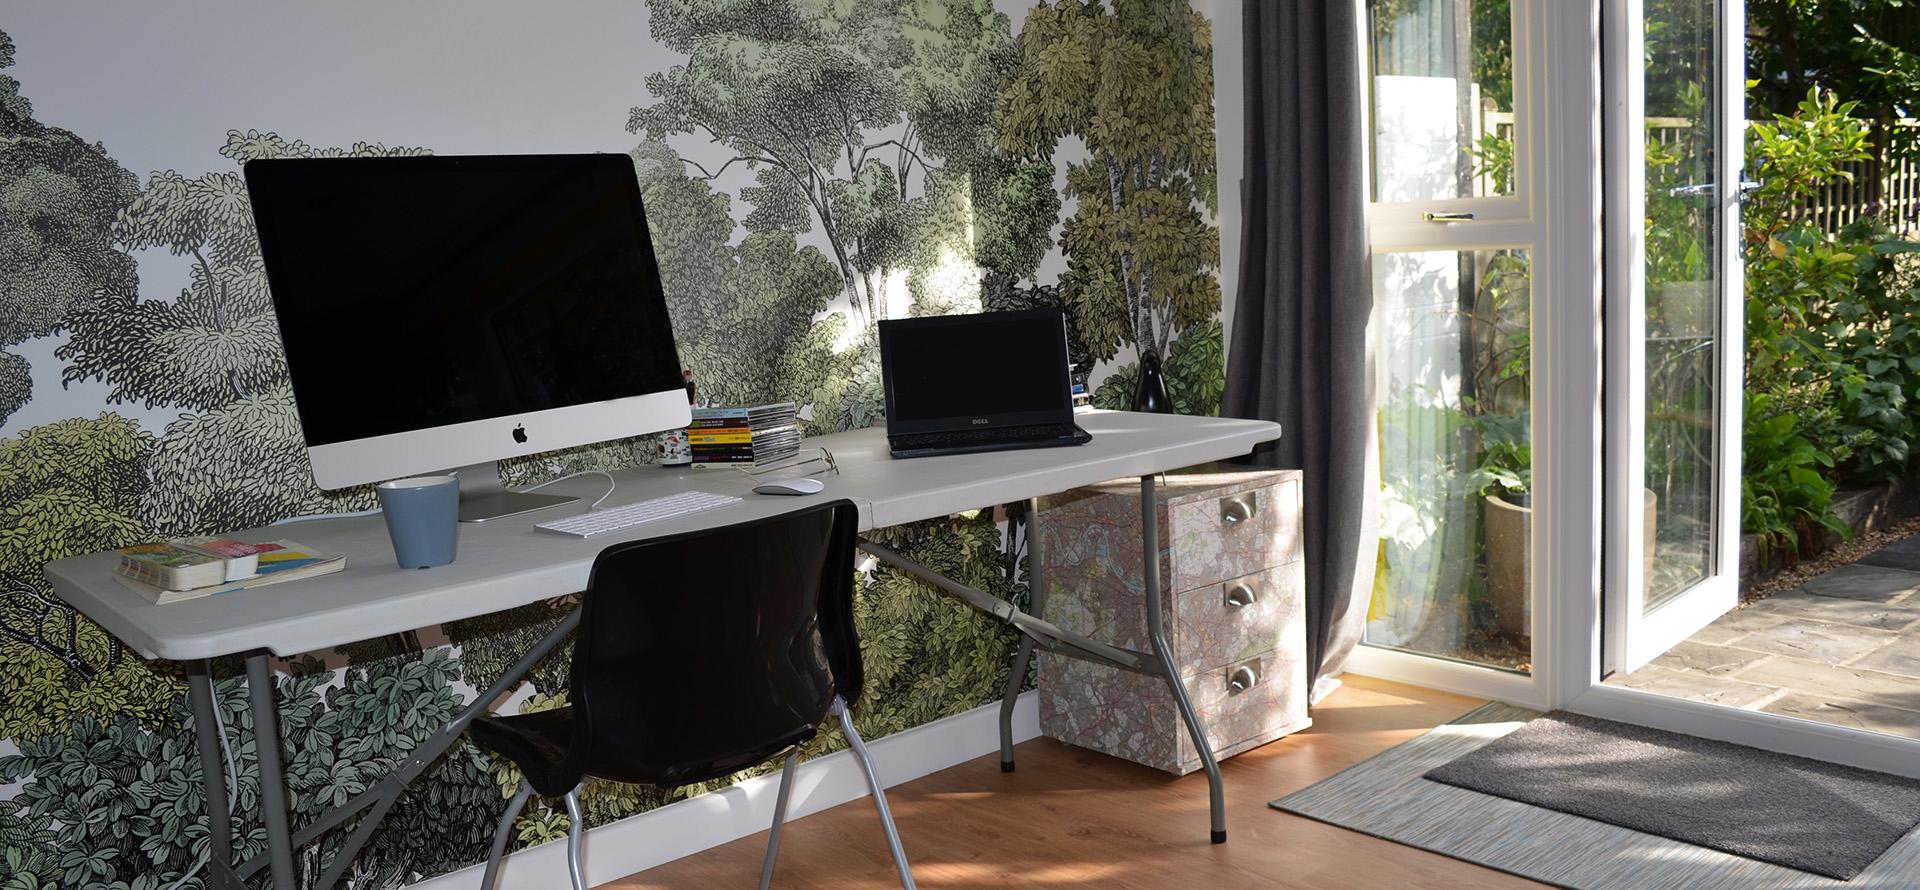 9thPlanet Design studio